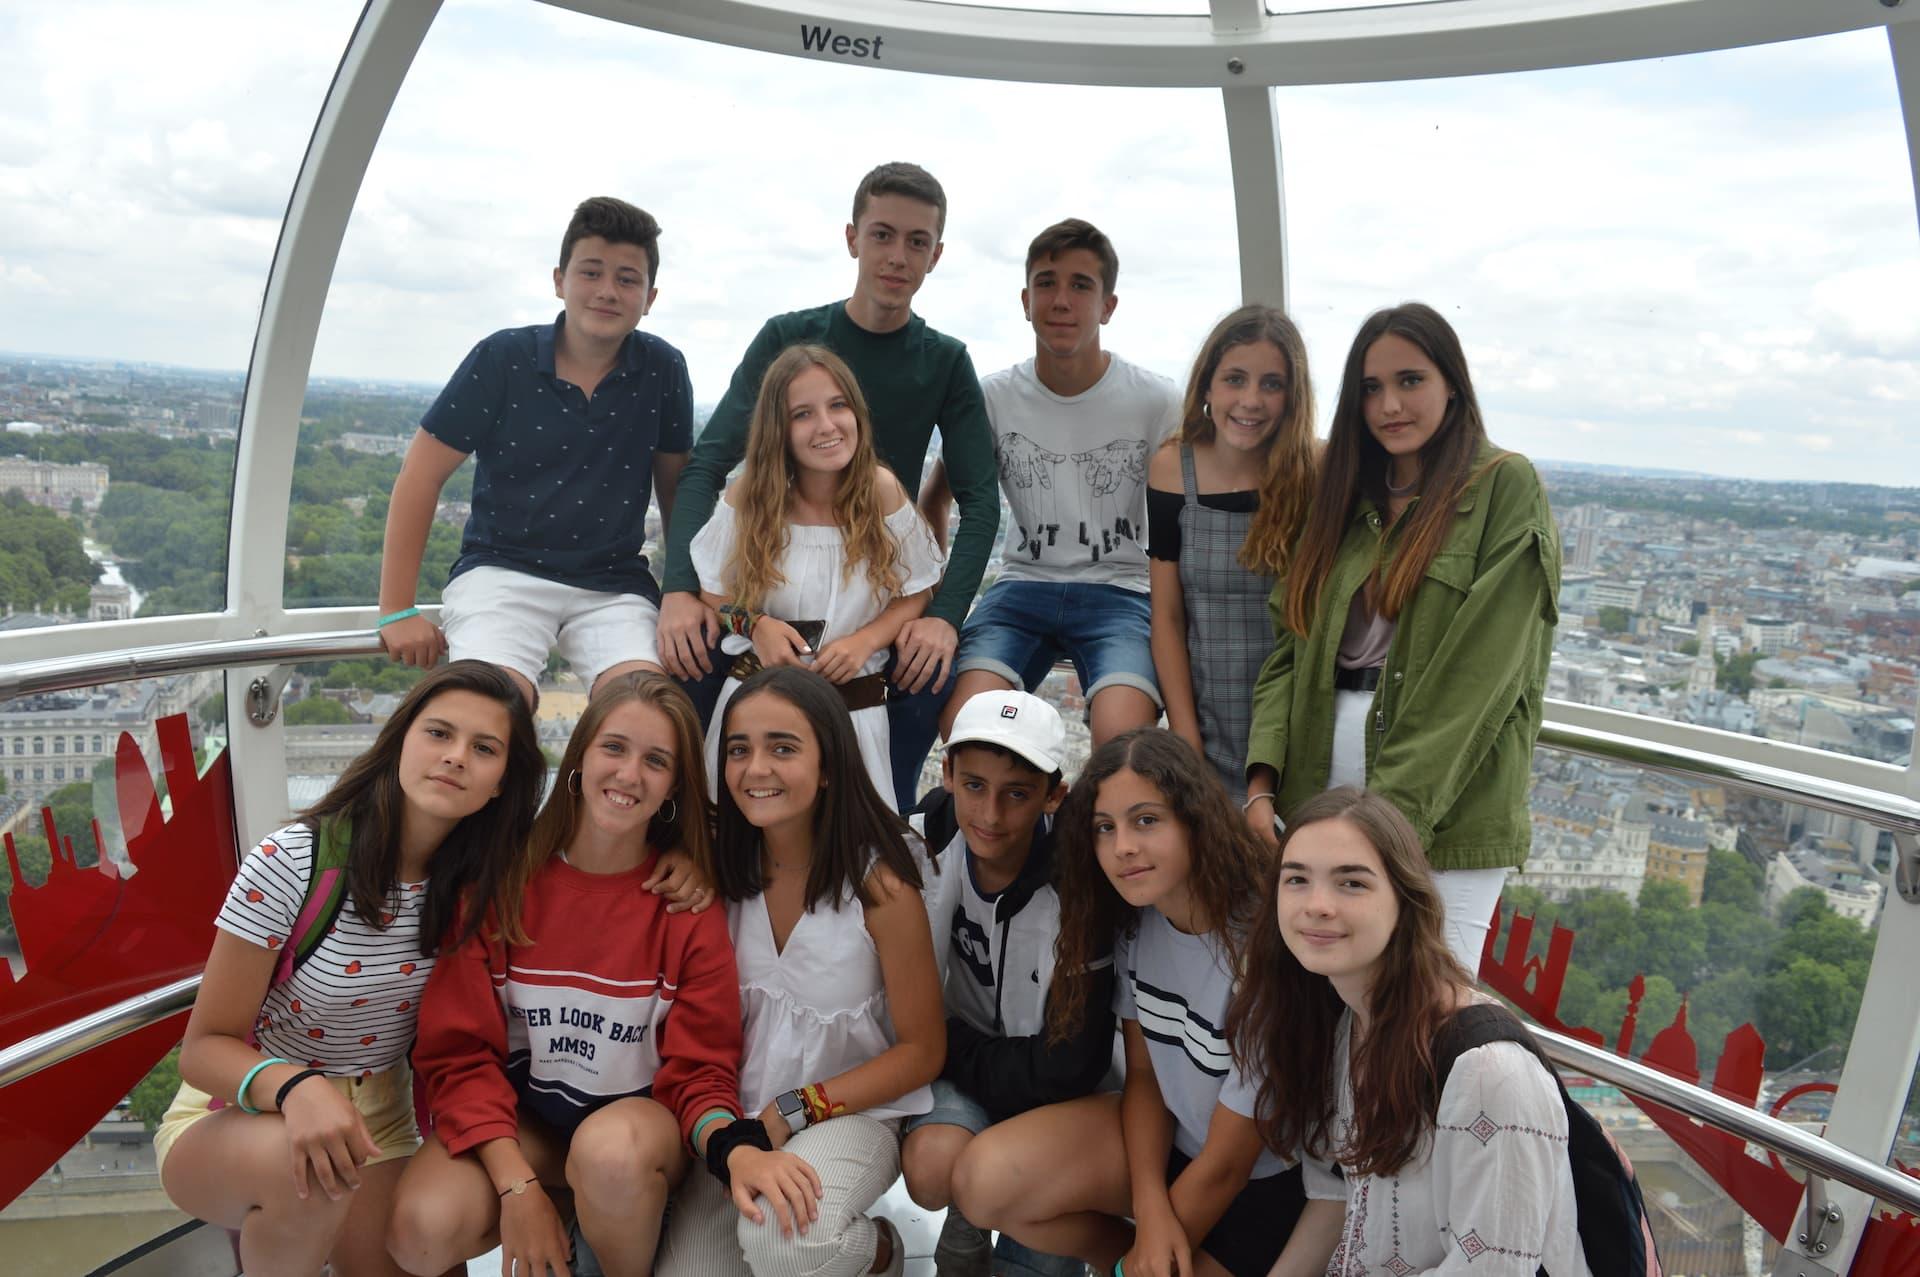 Students in London Eye - marlborough college summer school